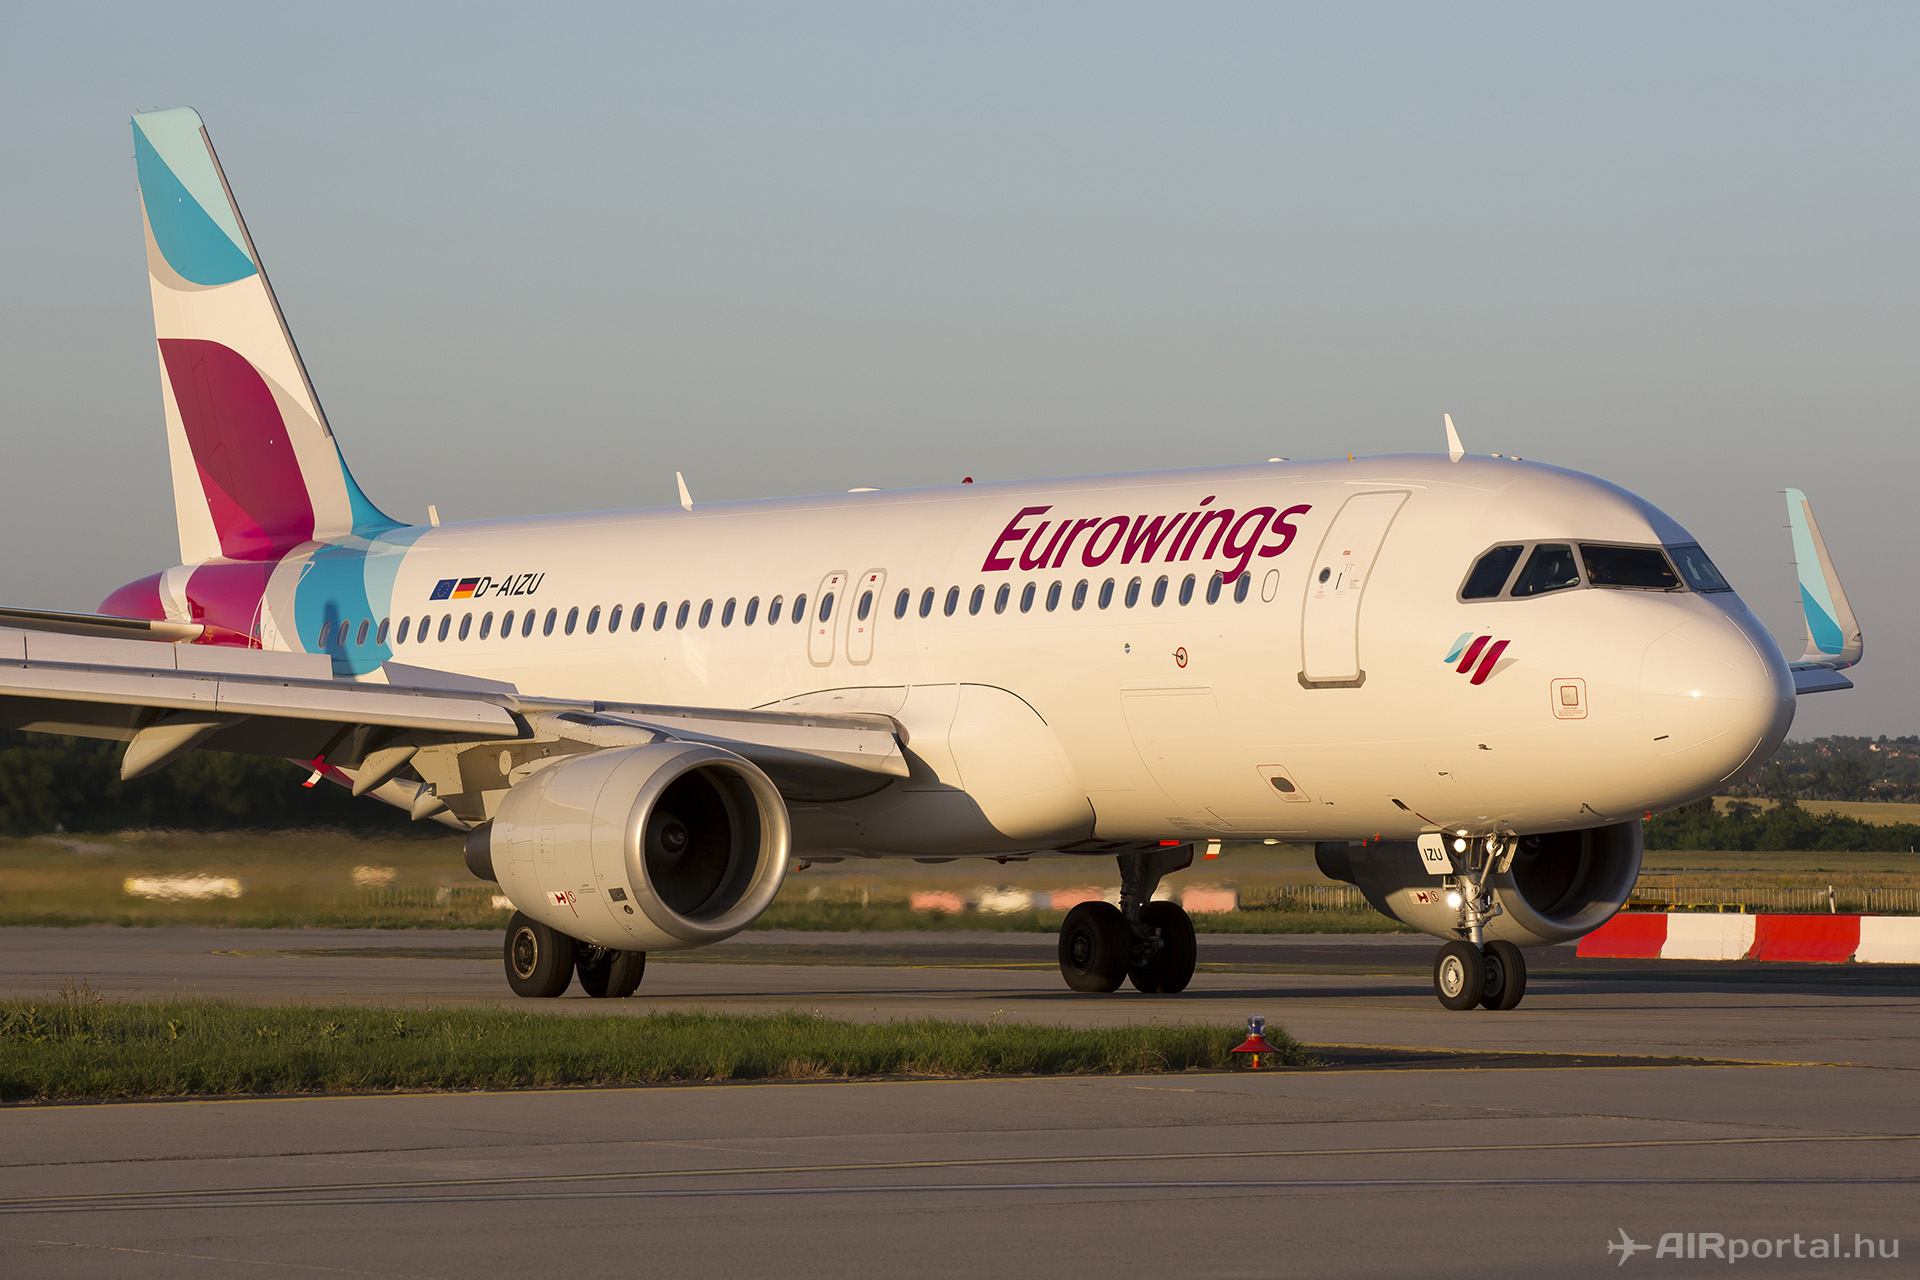 A Eurowings Airbus A320-as repülőgépe. (Fotó: AIRportal.hu) | © AIRportal.hu